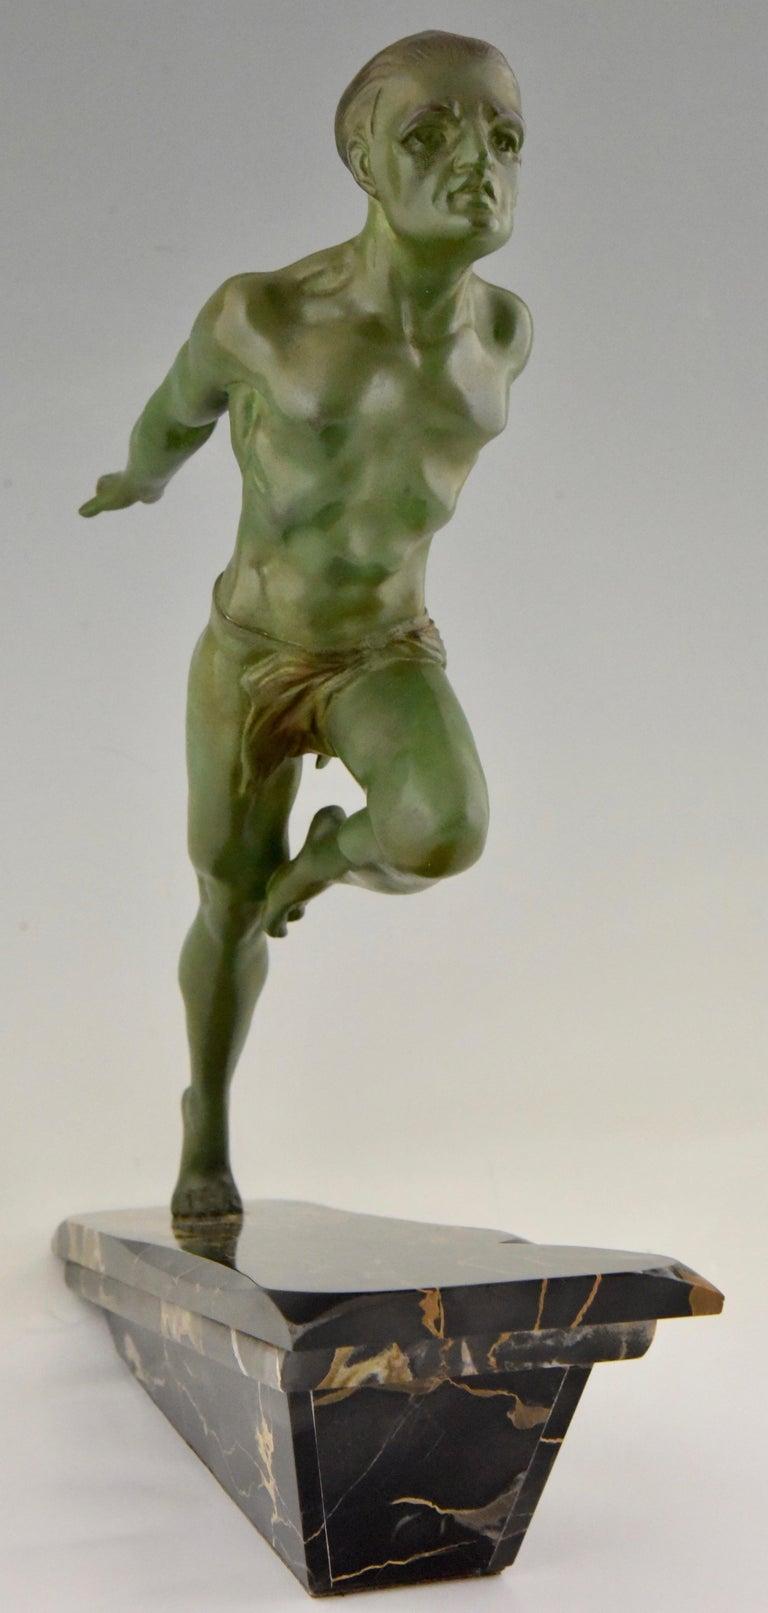 Spelter Art Deco Running Man Statue by L. Valderi French For Sale